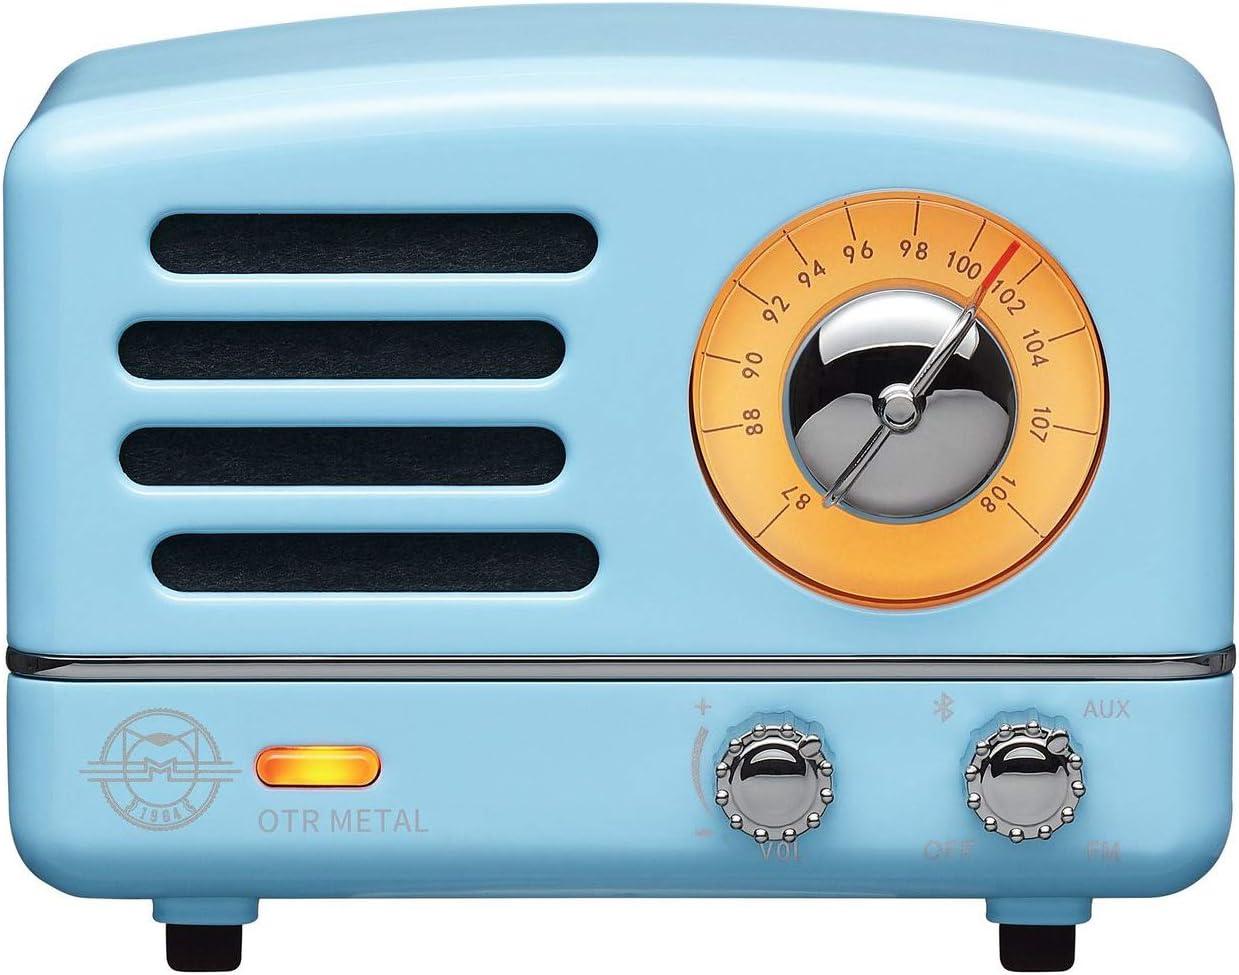 Muzen Portable Wireless High Definition Audio FM Radio Bluetooth Speaker, Metal Blue, Travel Case Included – Classic Vintage Retro Design